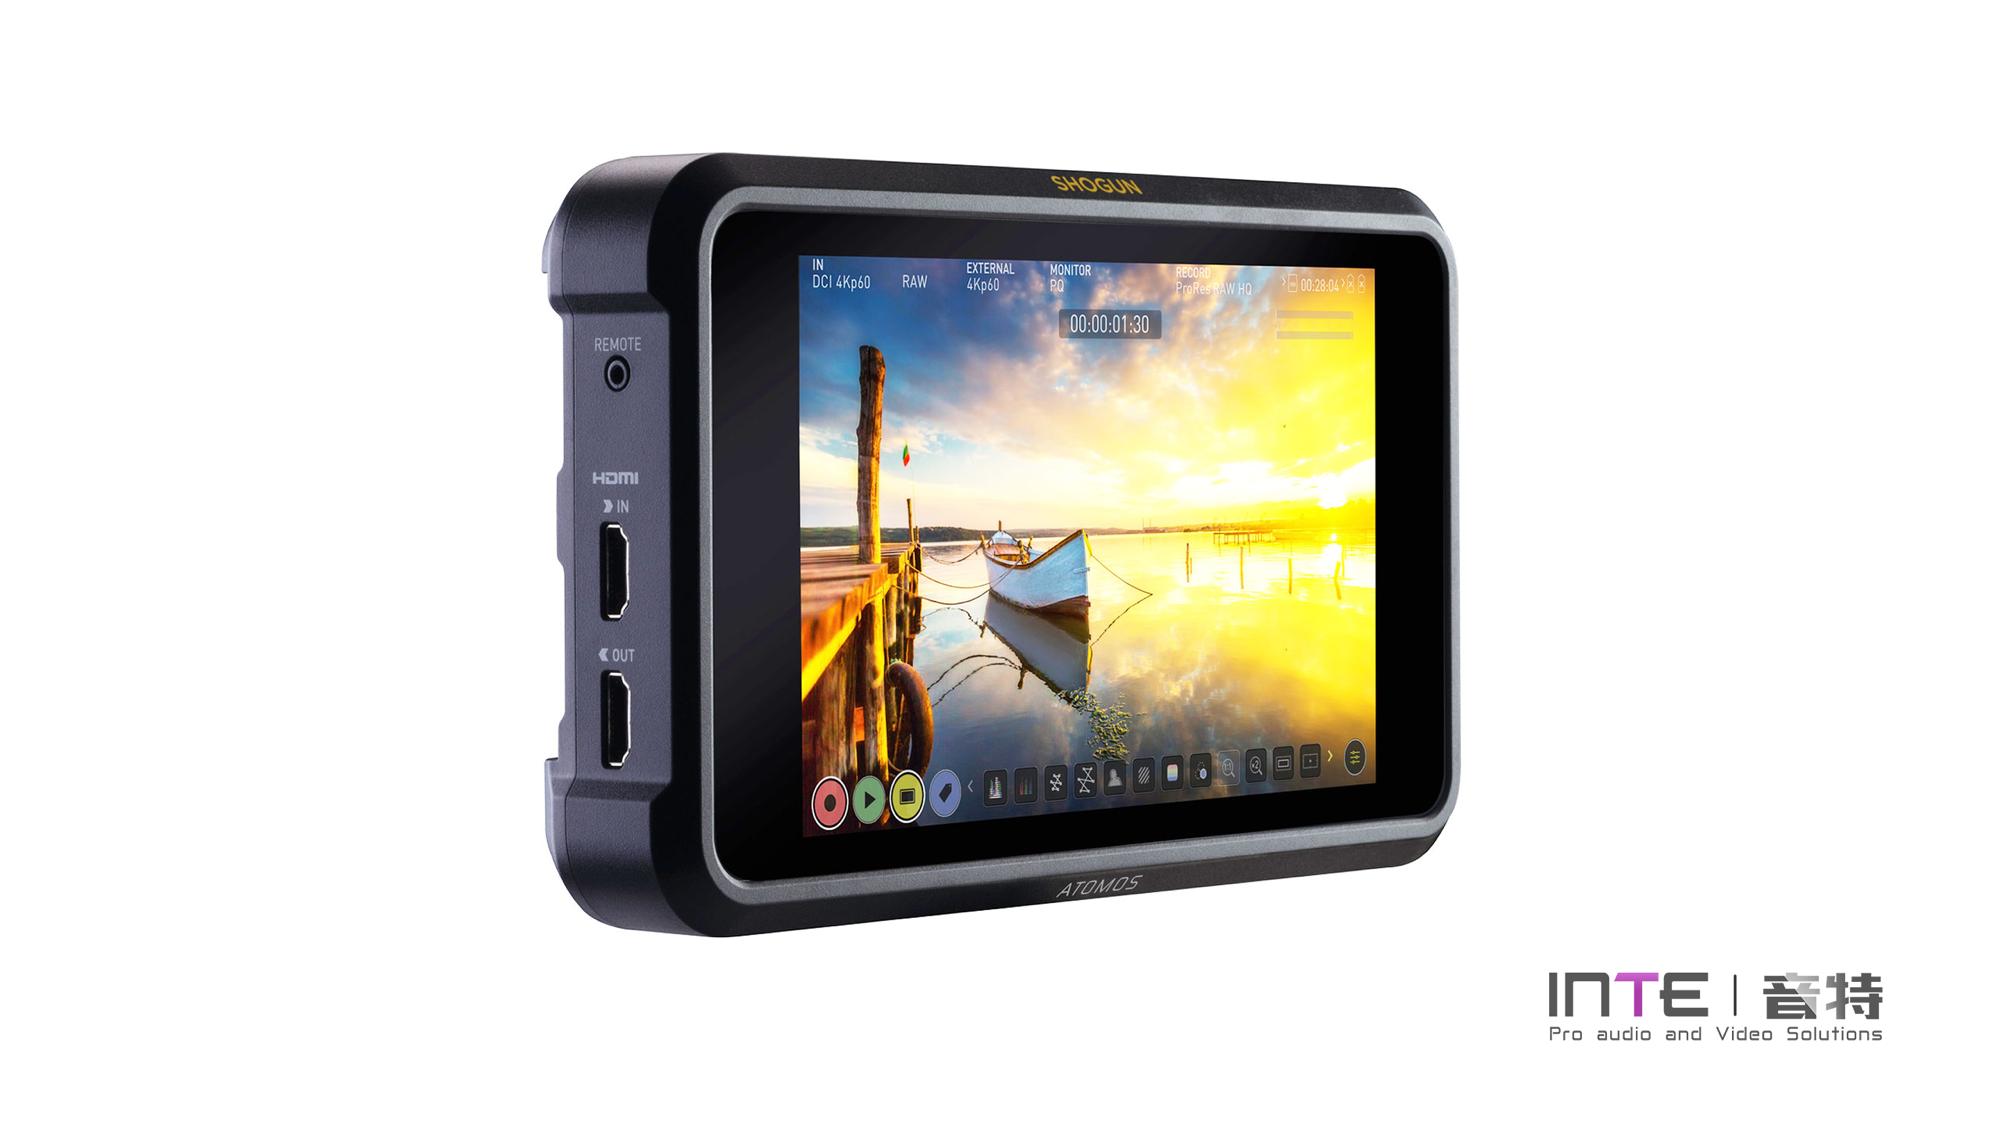 ATOMOS shogun7 7英寸超高亮度多功能4K HDR监视记录仪 监看录制监视器记录仪